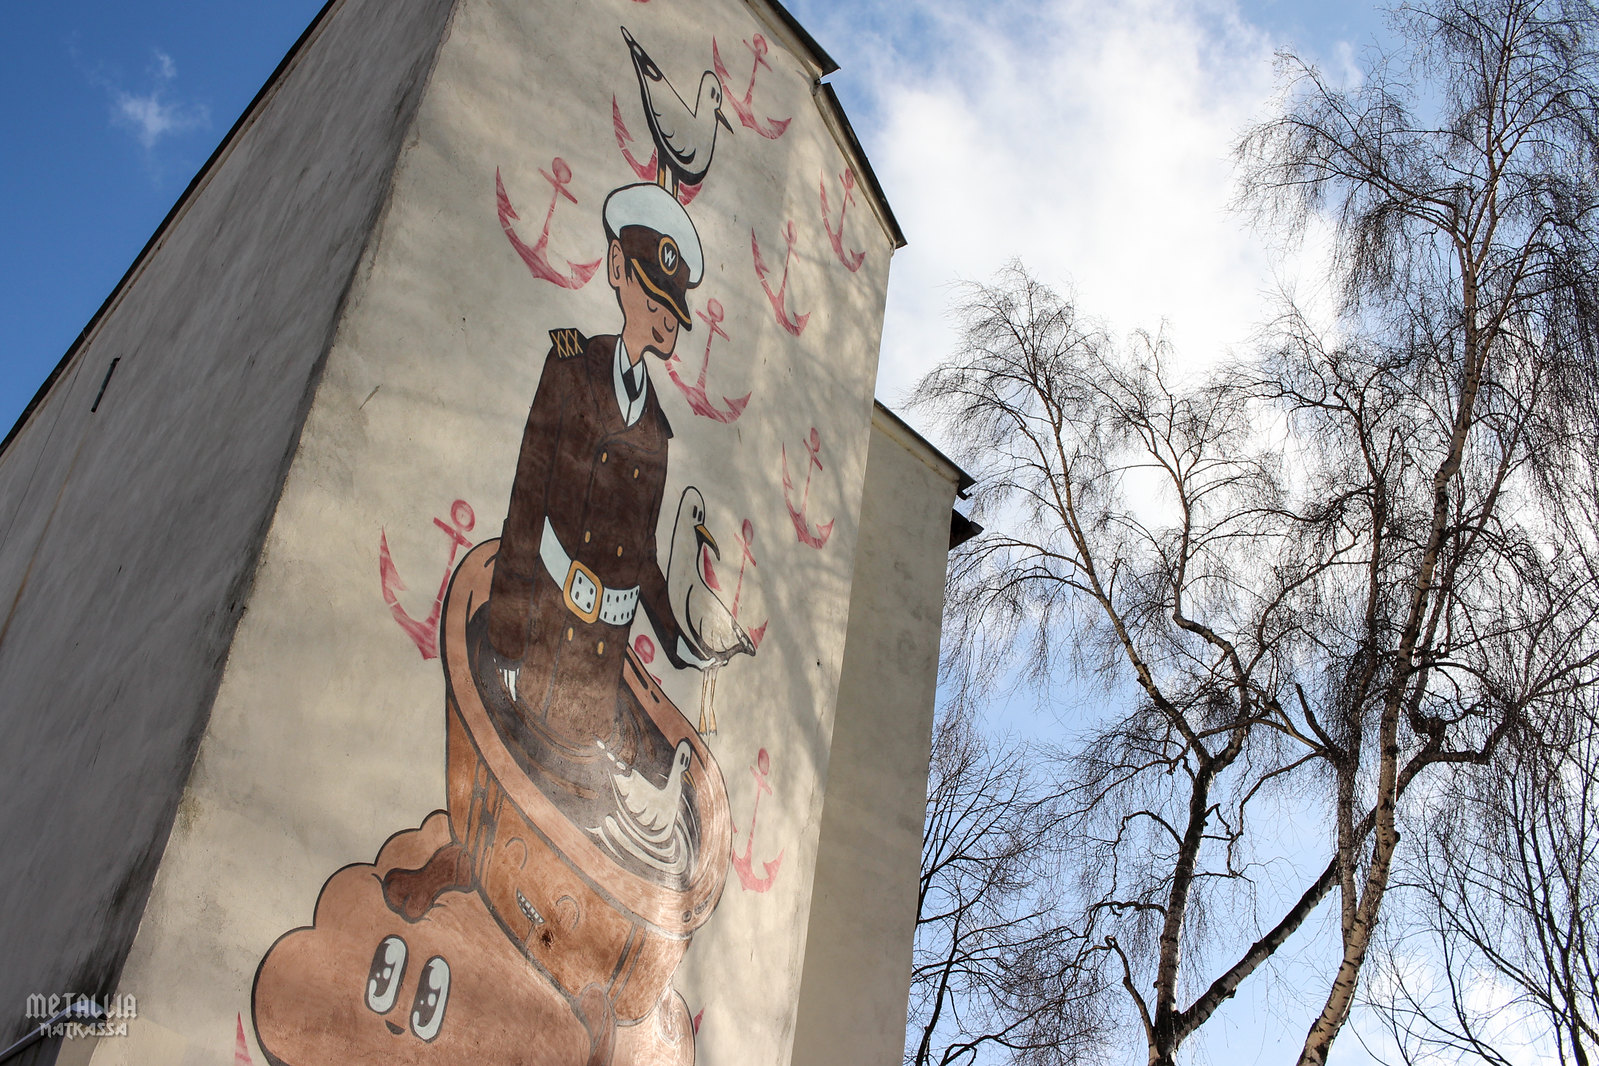 street art in gdynia, gogdynia, visit gdynia, street art, katutaide, gdynia, trojmiasto